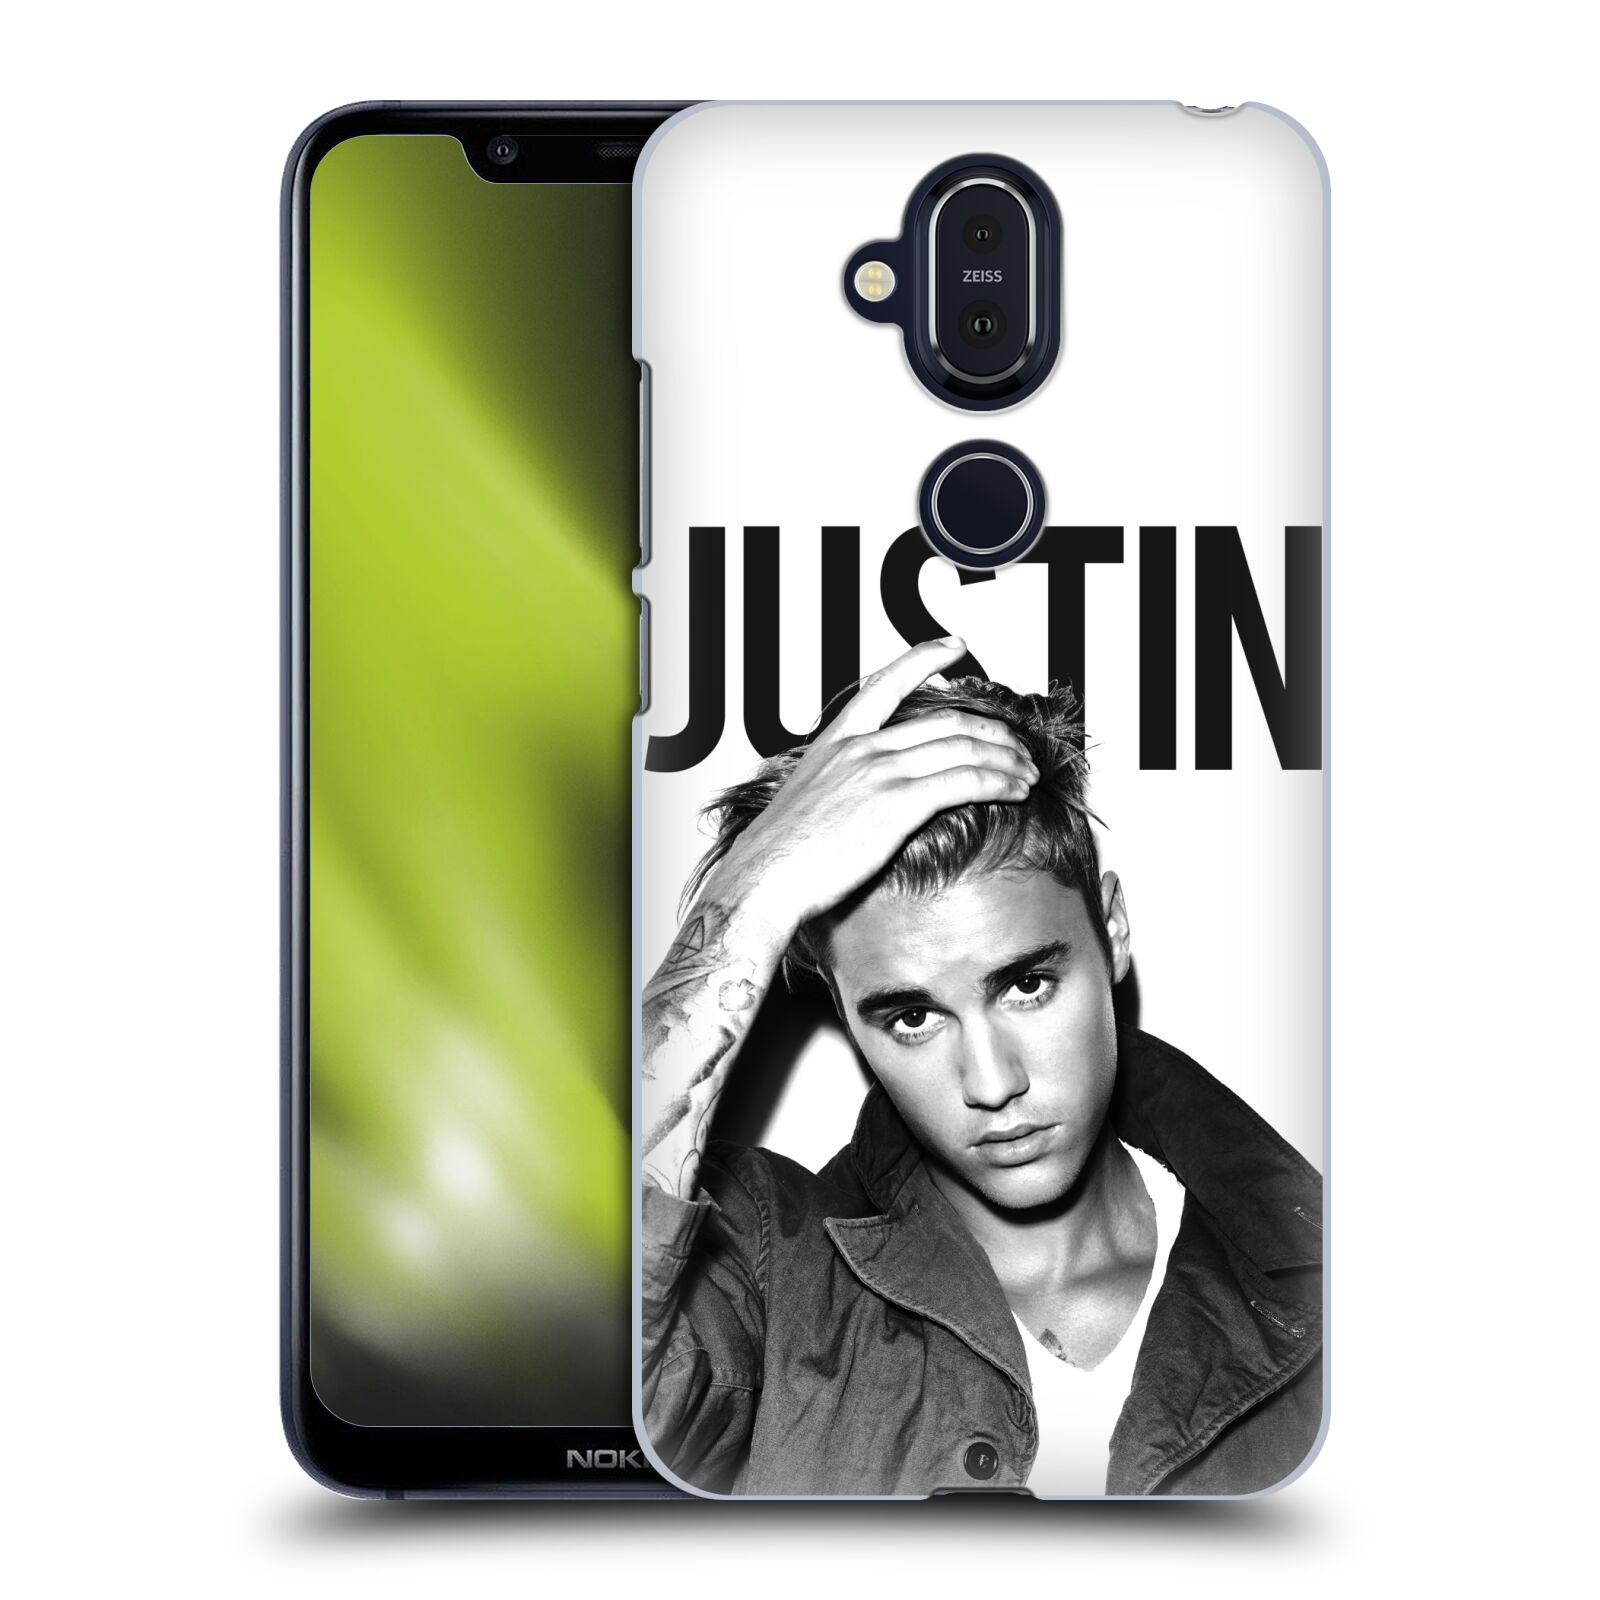 Plastové pouzdro na mobil Nokia 8.1 - Head Case - Justin Bieber Official - Póza